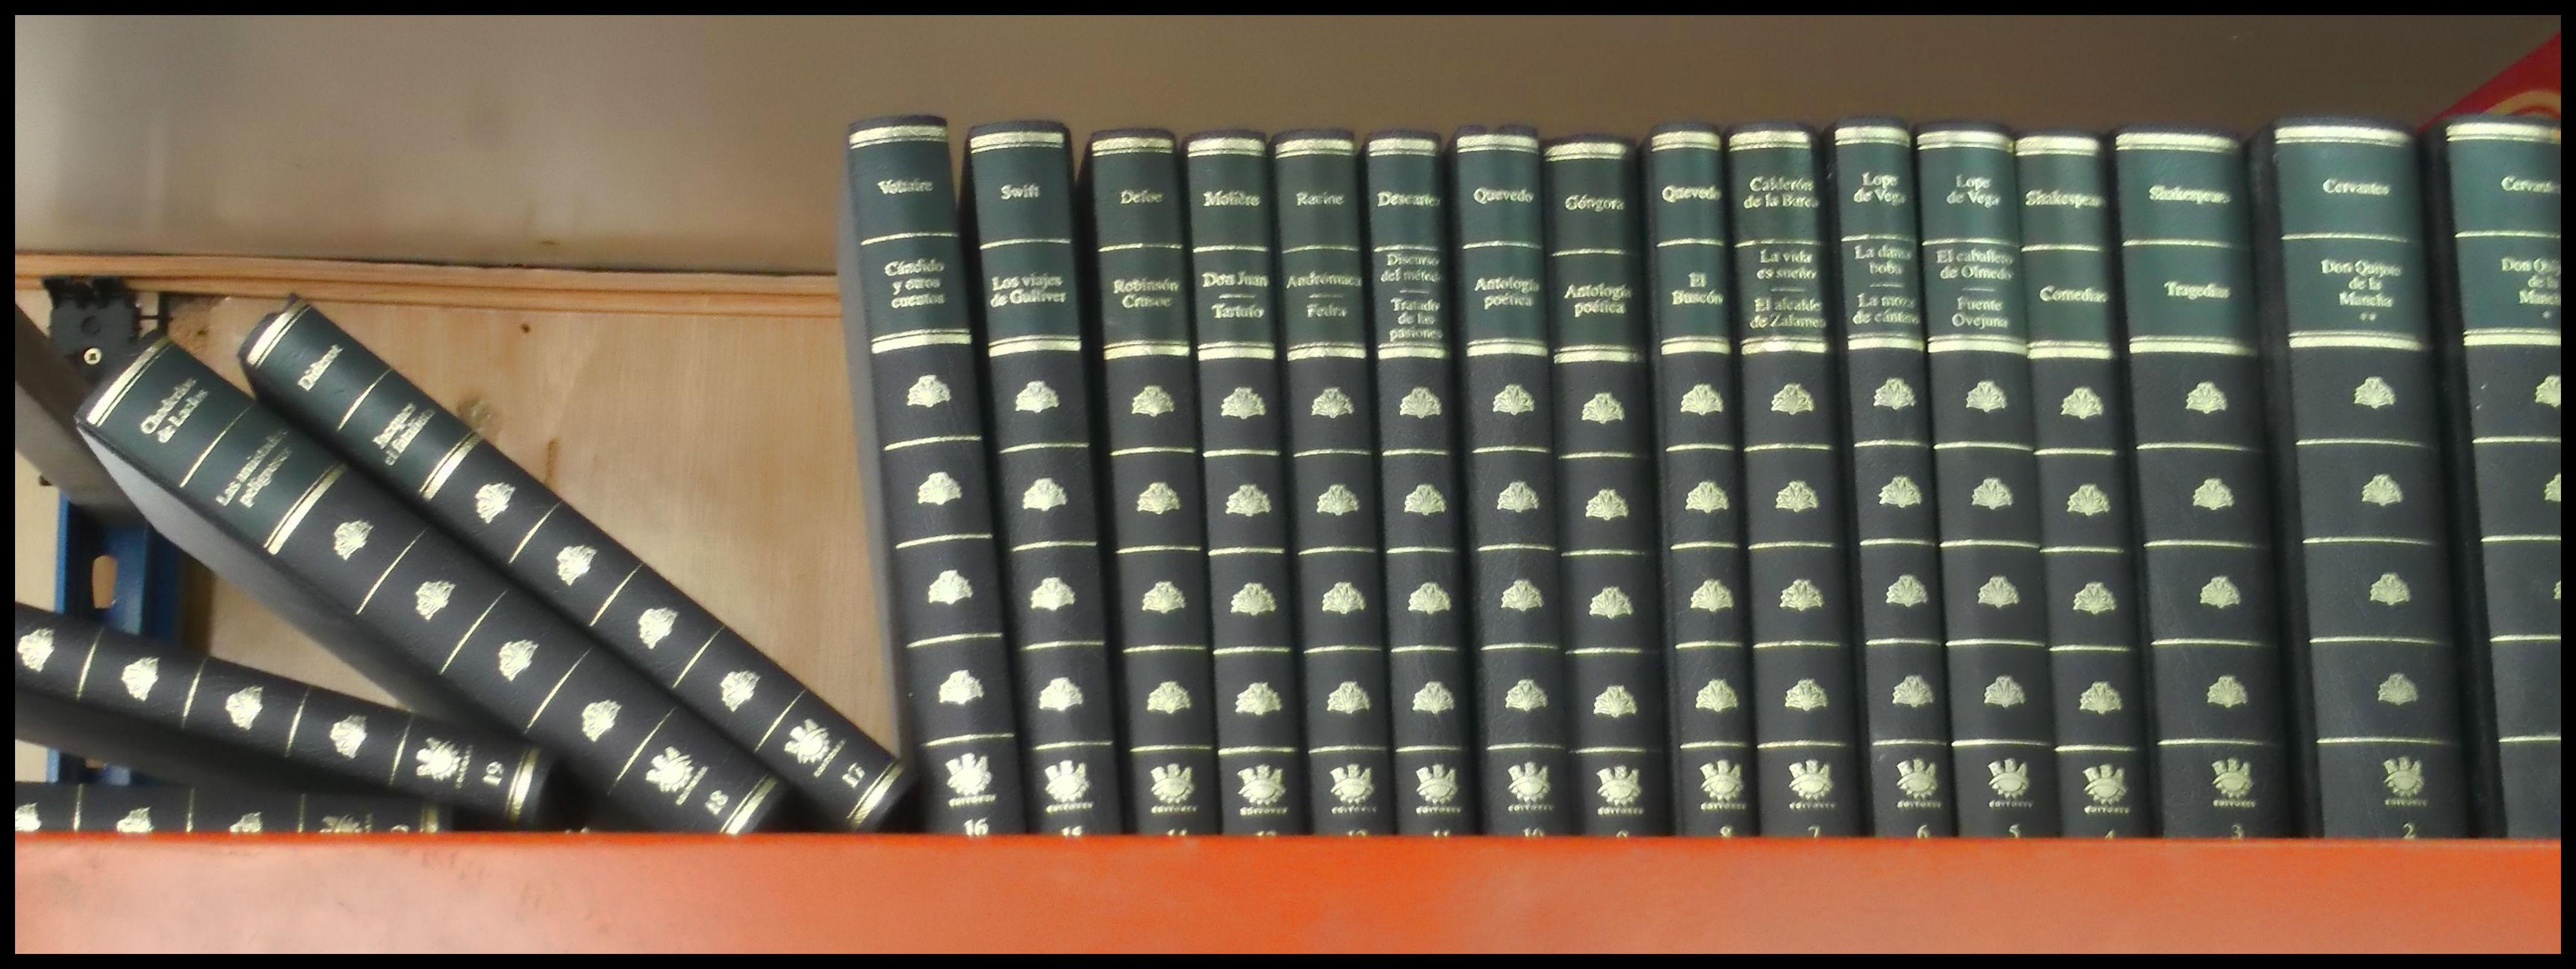 COLECCIÓN LITERARIA: Catálogo de Autodesguaces De Blas